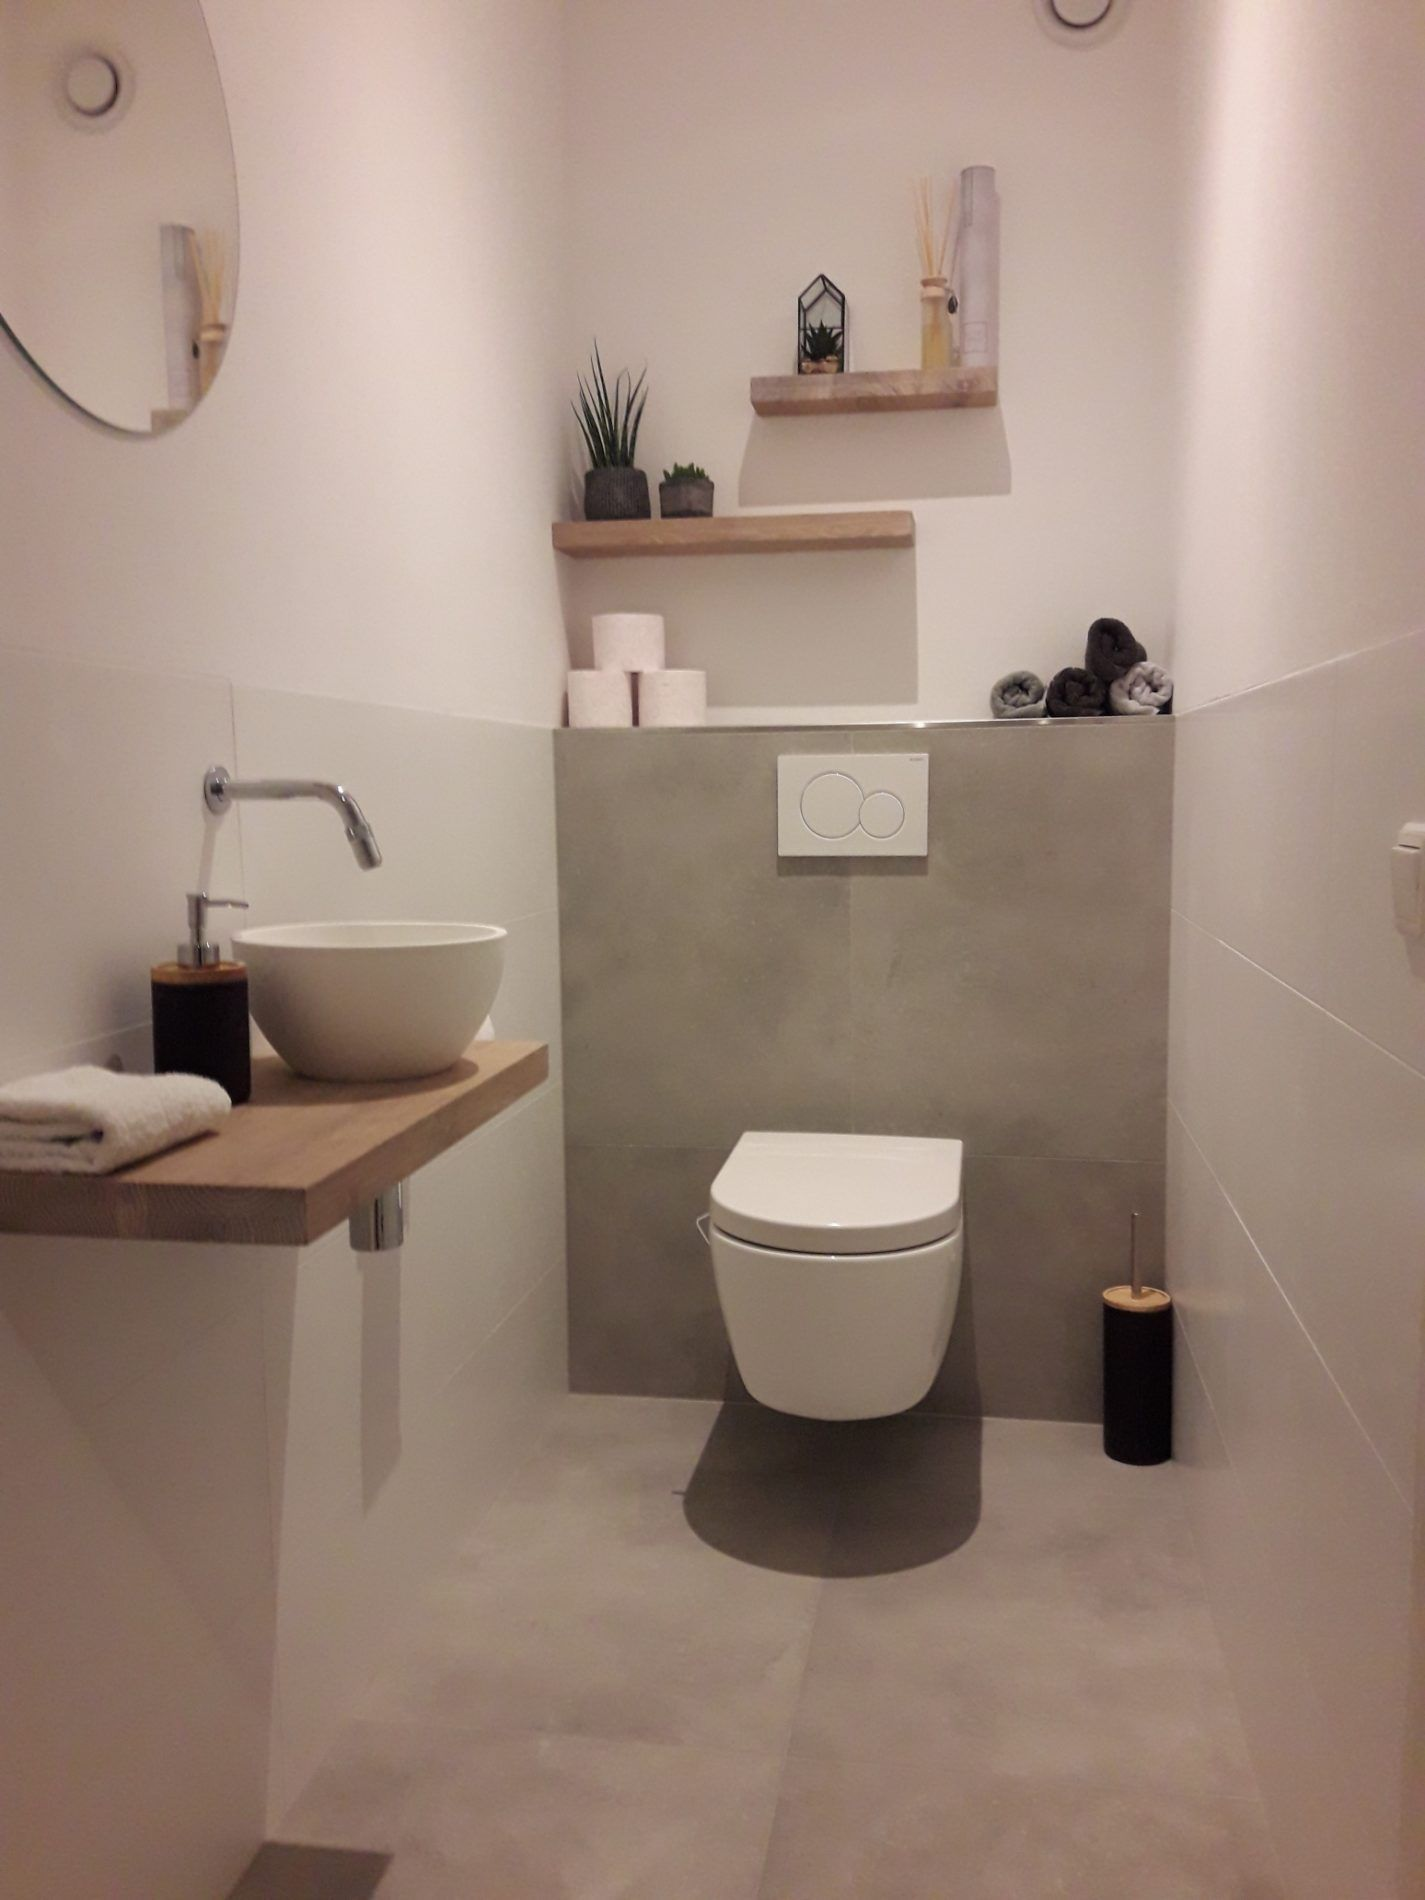 Badkamer Familie Veenstra Sani4all Smalltoiletroom Badkamer Familie Veenstra Sani4all In 2020 Neues Badezimmer Badezimmer Badezimmer Klein